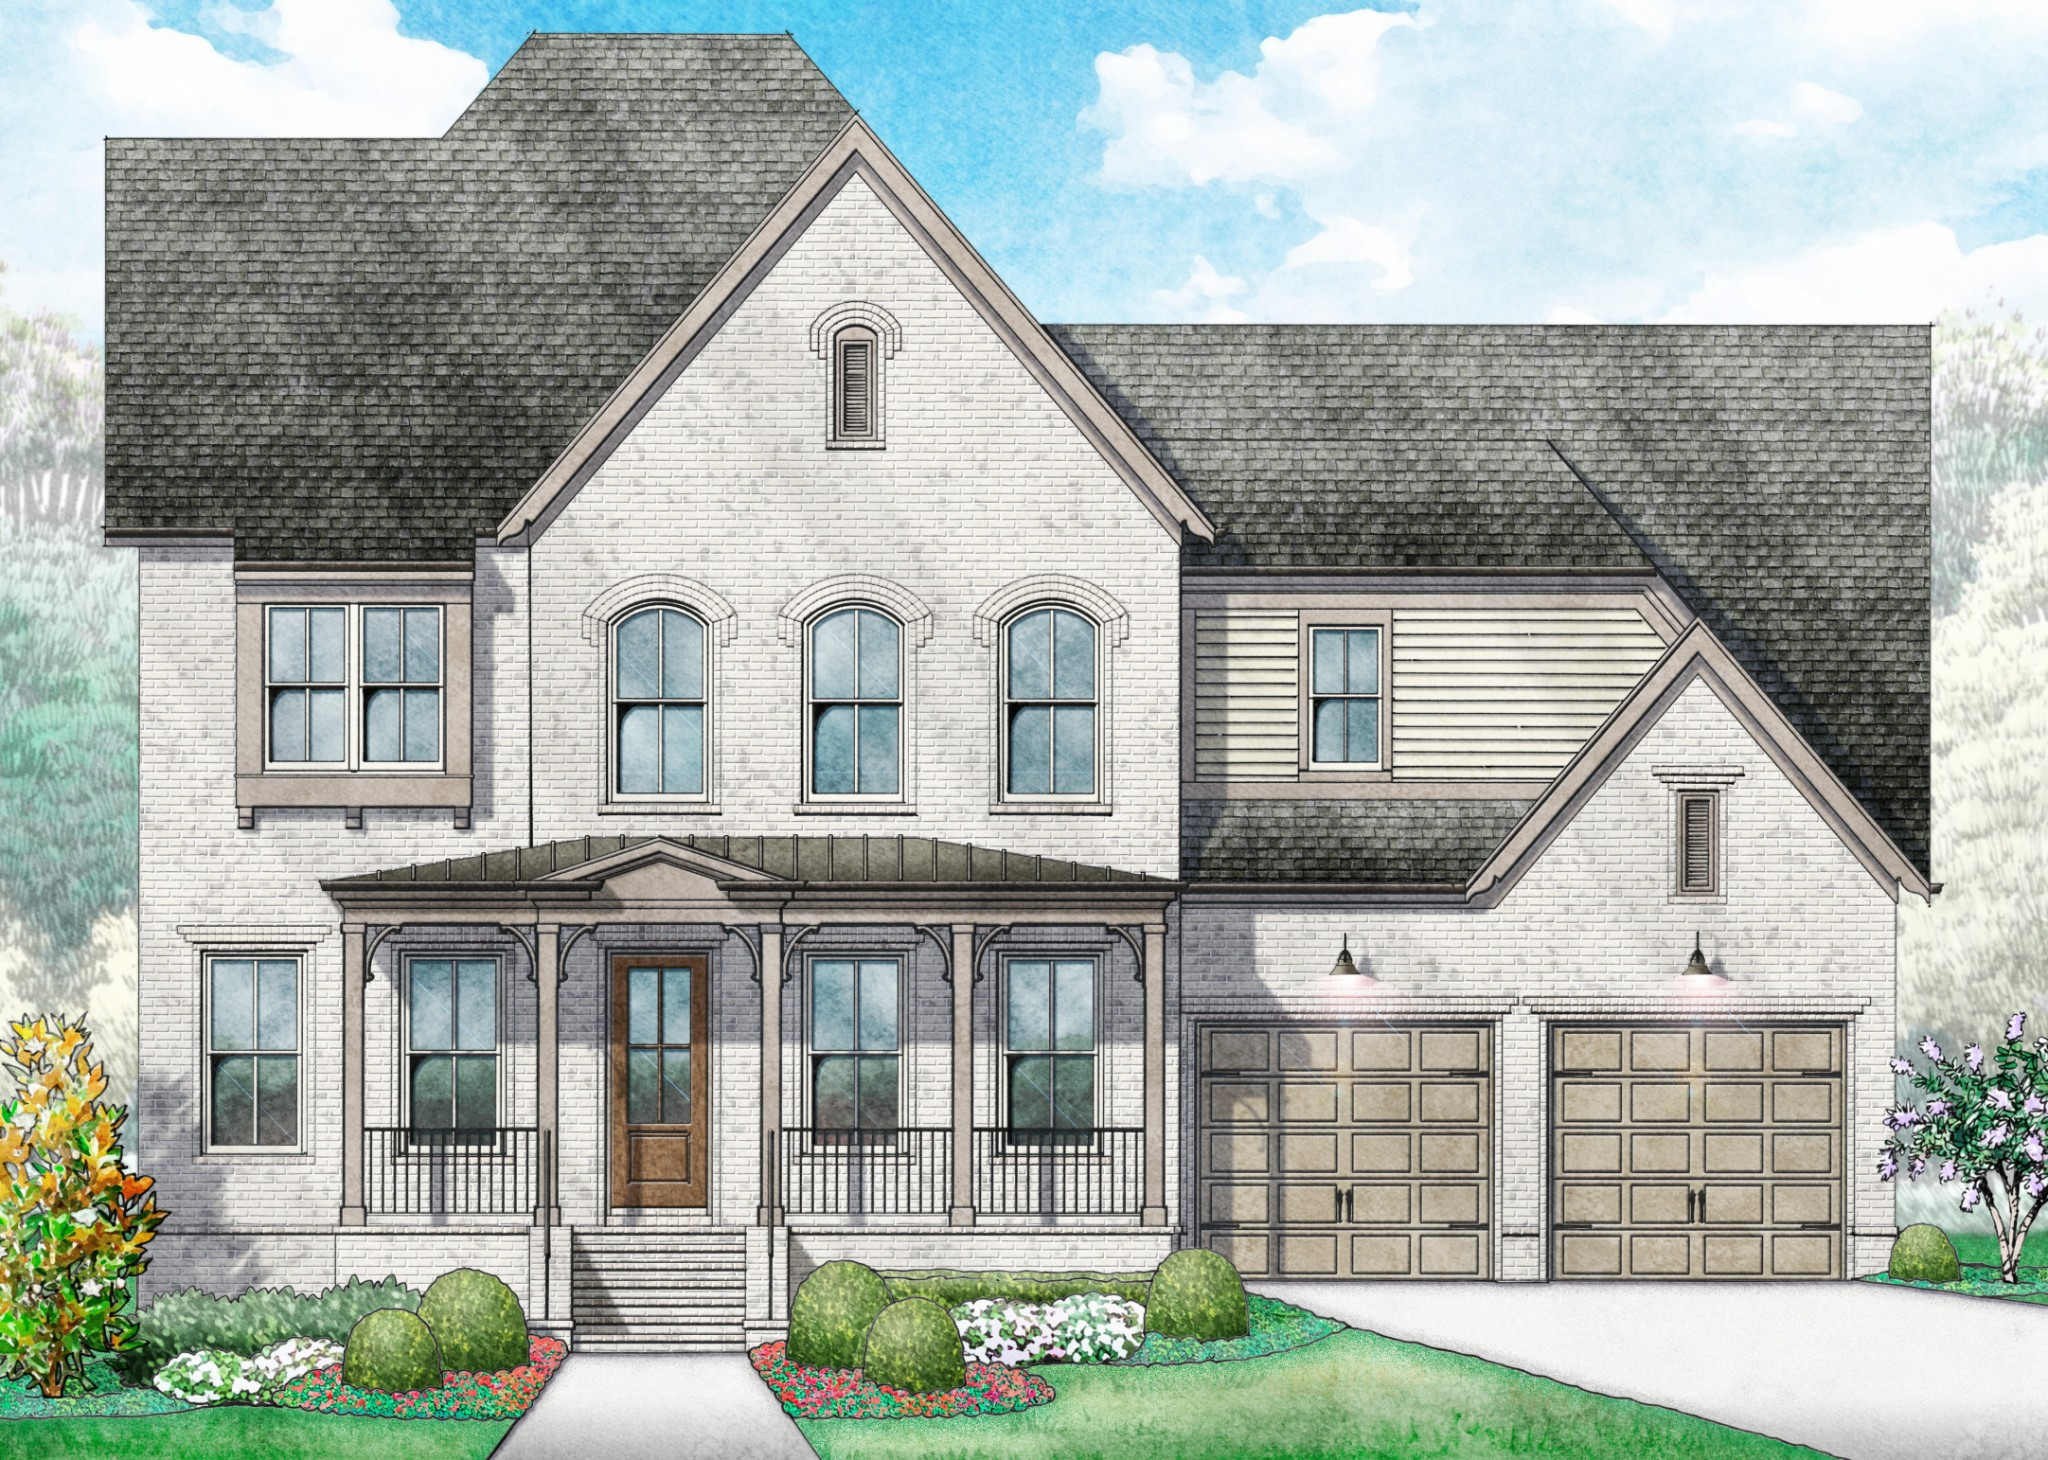 873 Cheltenham Ave, Lot # 2145 Property Photo - Franklin, TN real estate listing